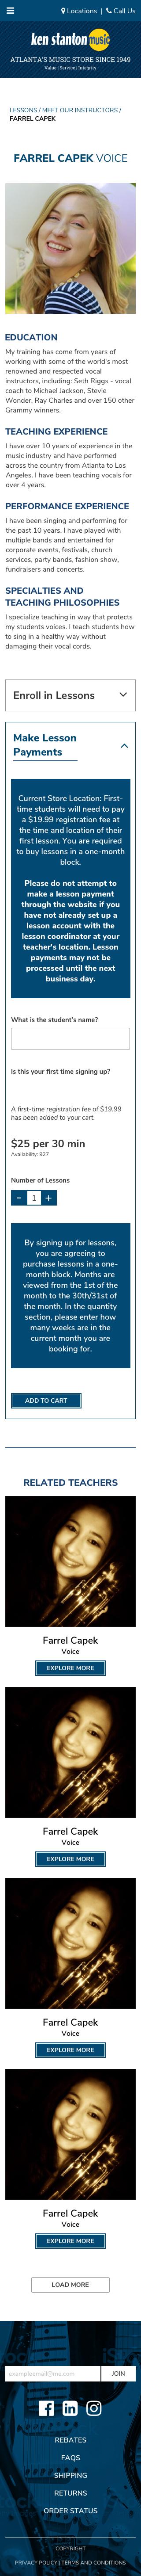 v3-Teacher-Page-Mobile-Option2-Make-Payment.jpg